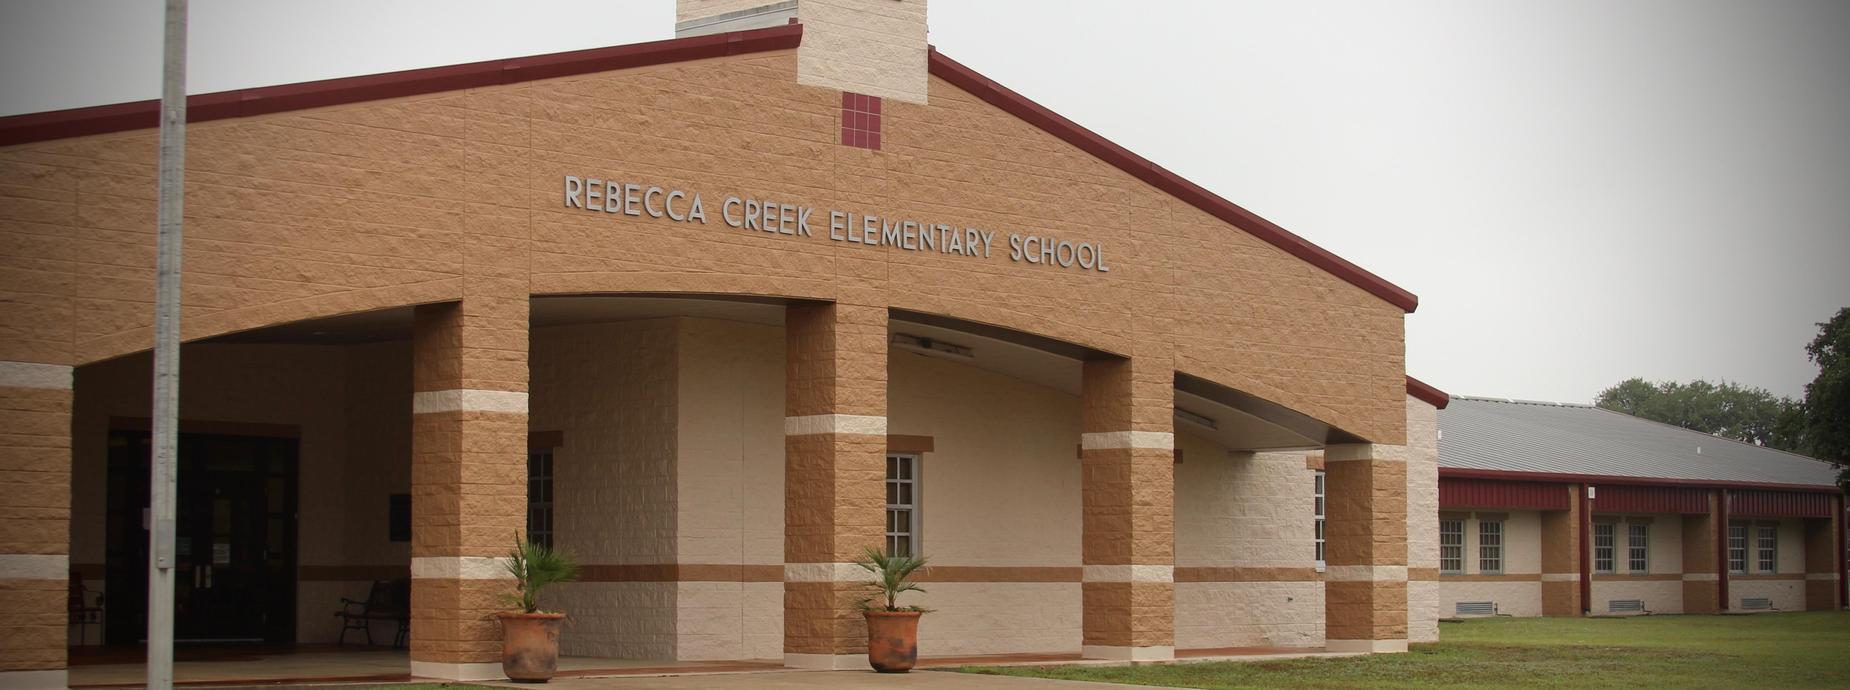 Rebecca Creek Elementary School